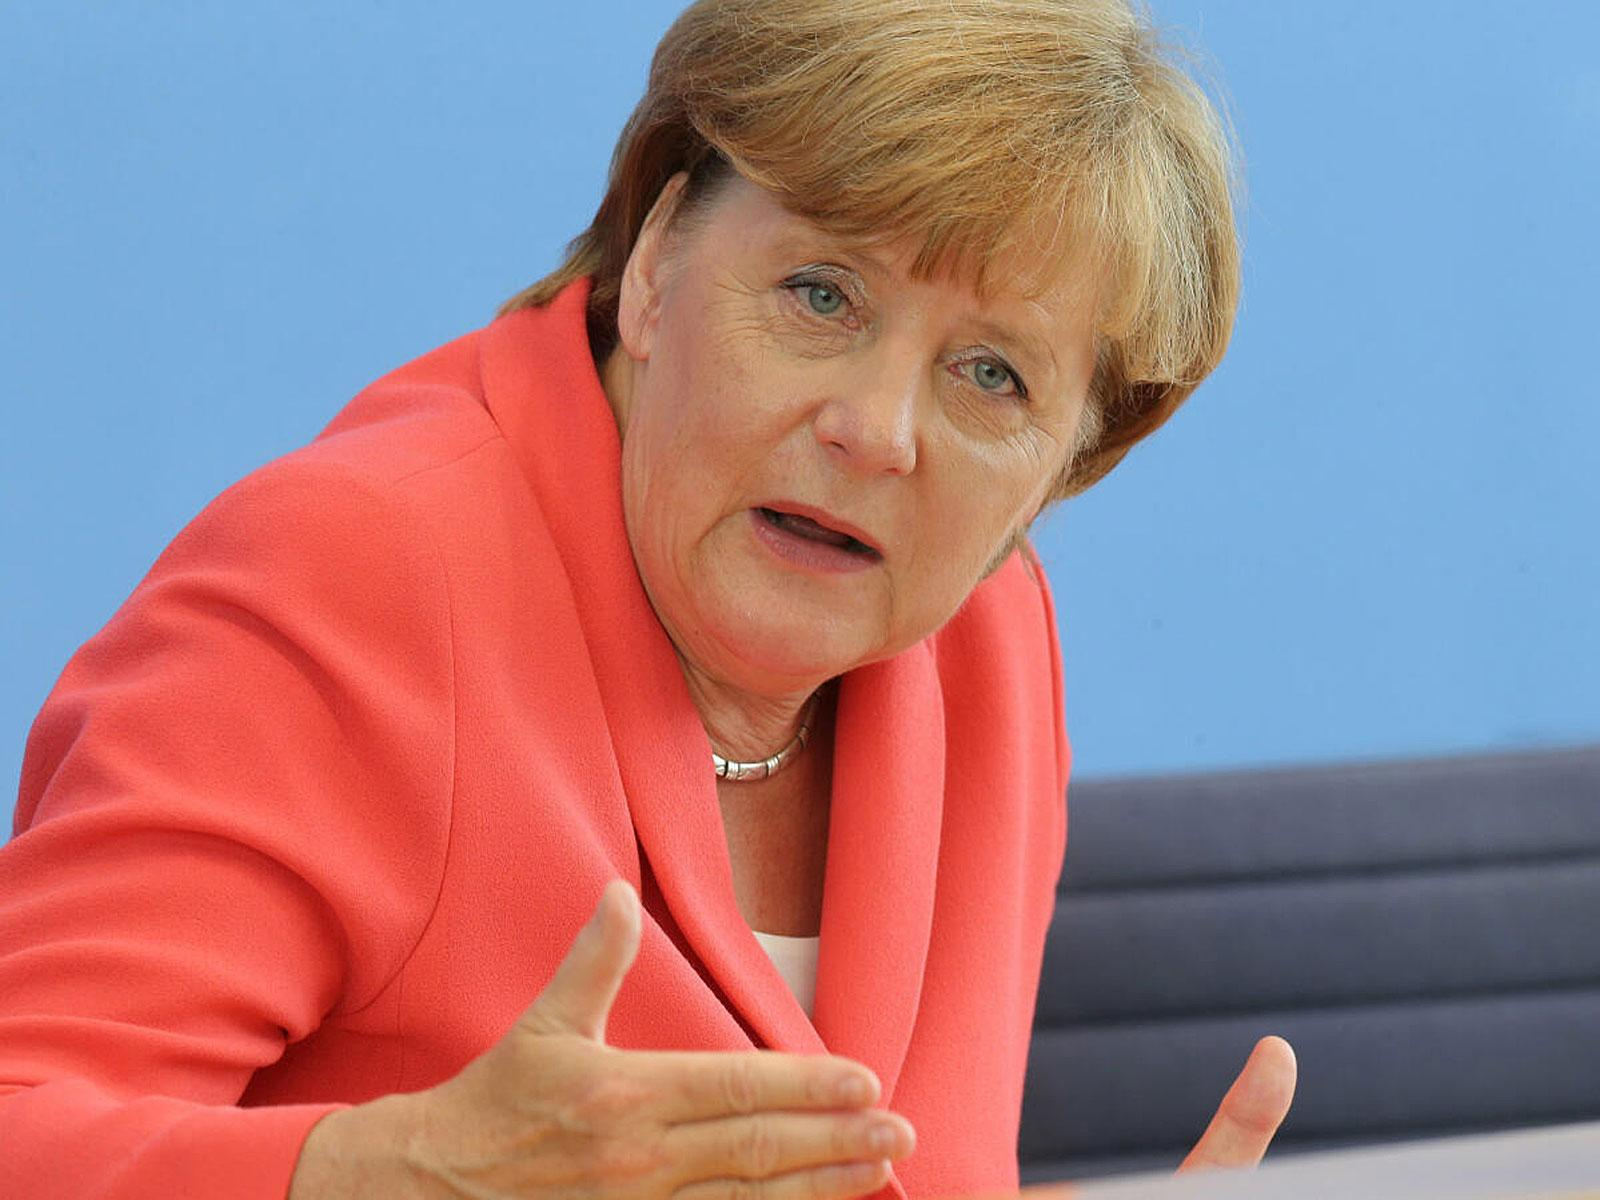 Thomas Berhold hat kein großes Vertrauen mehr in die Politik von Angela Merkel.